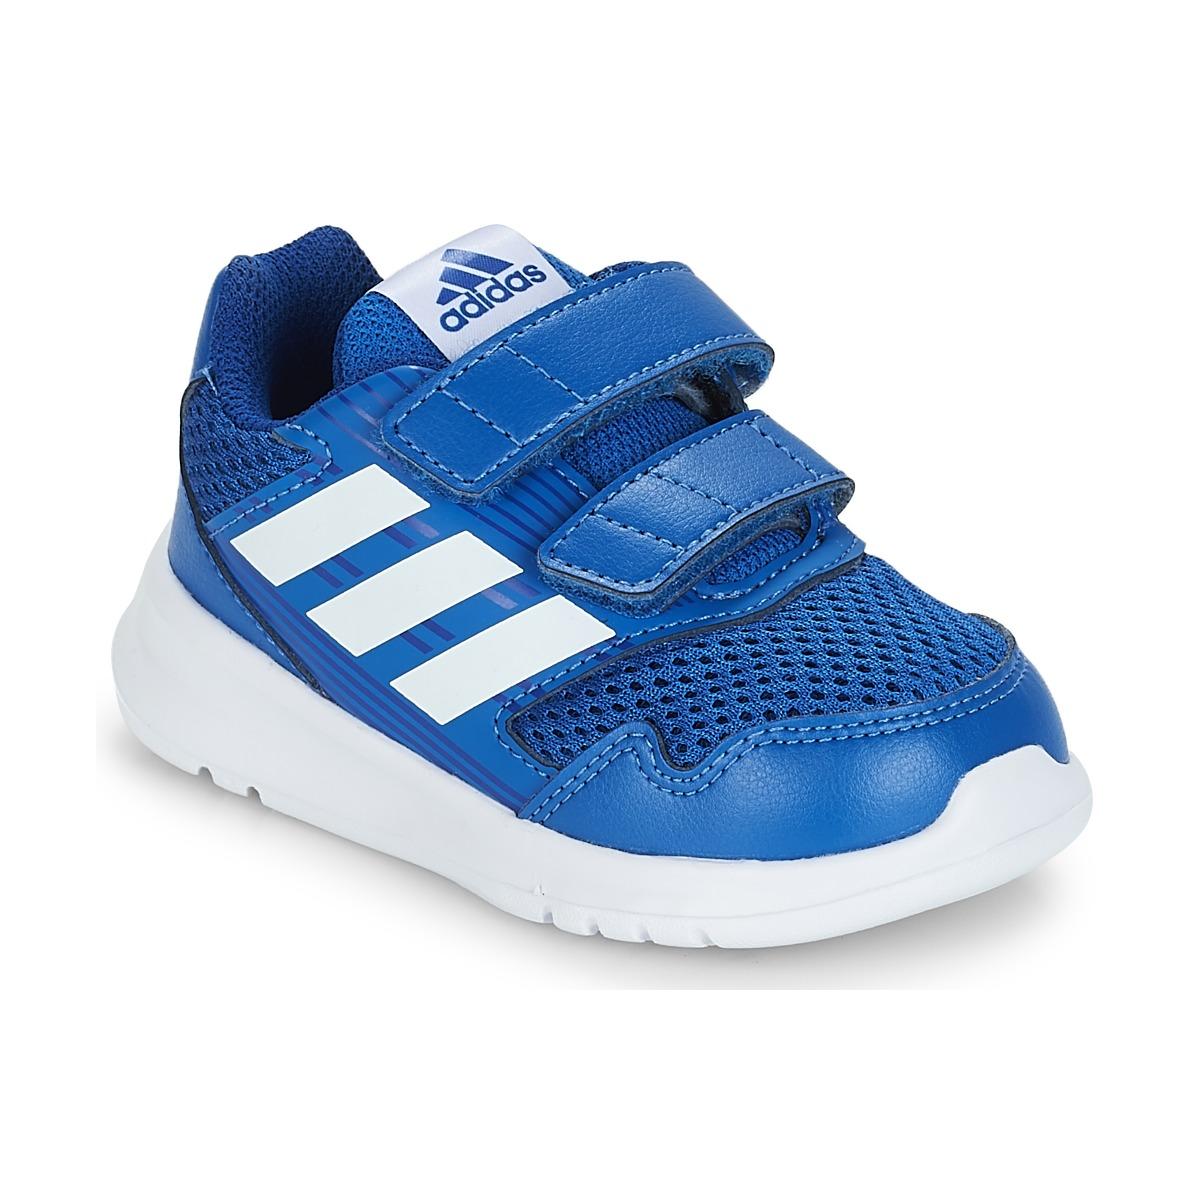 new product ebd52 61adb SNEAKERS. Adidas